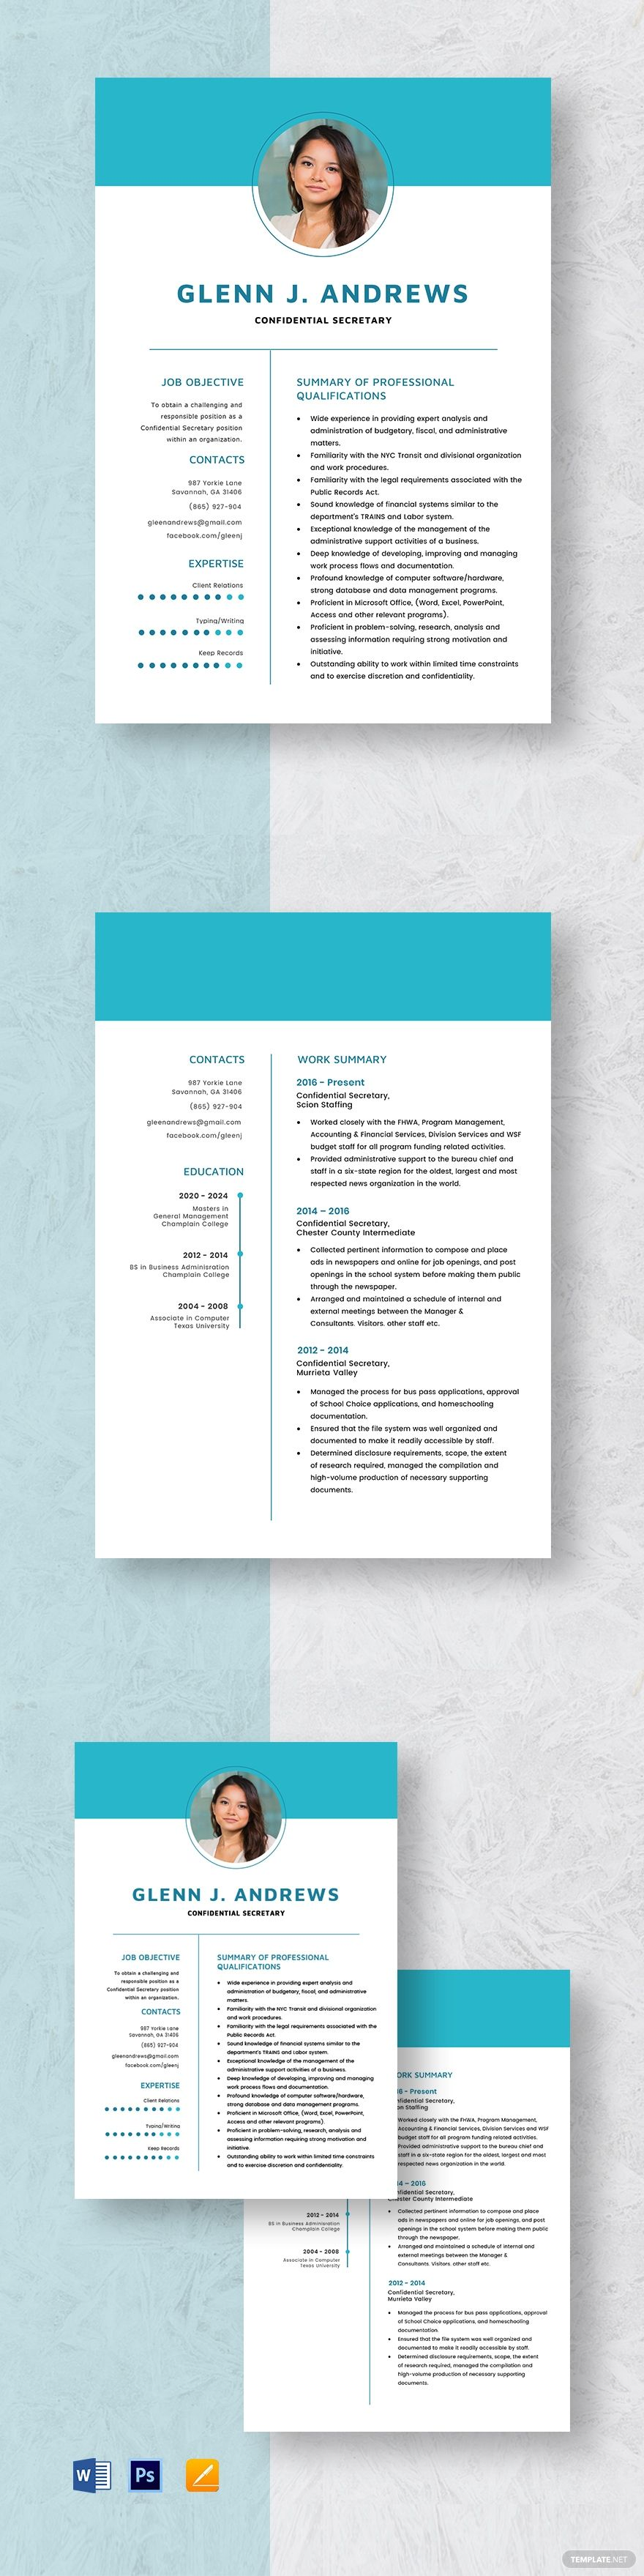 Confidential secretary resume template in 2020 resume